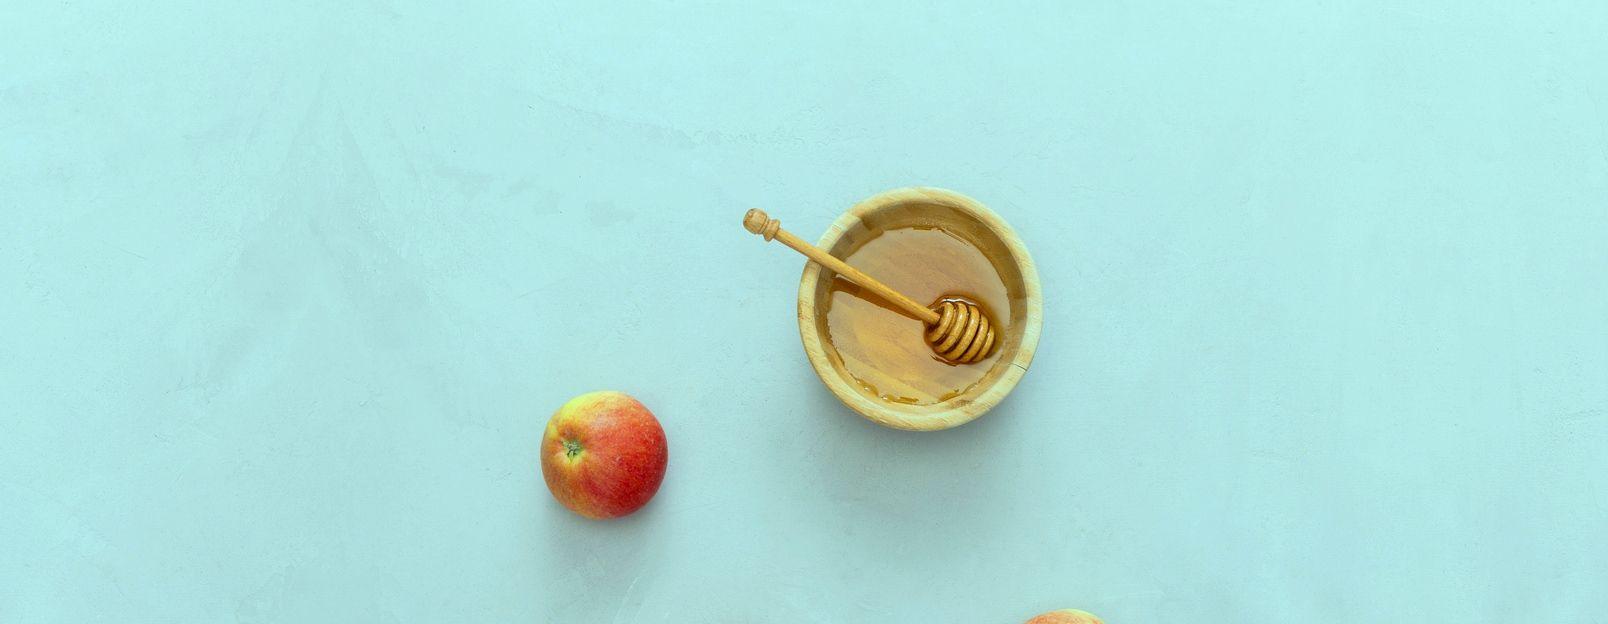 10 edulcorantes naturales que sustituyen el azúcar - Featured image